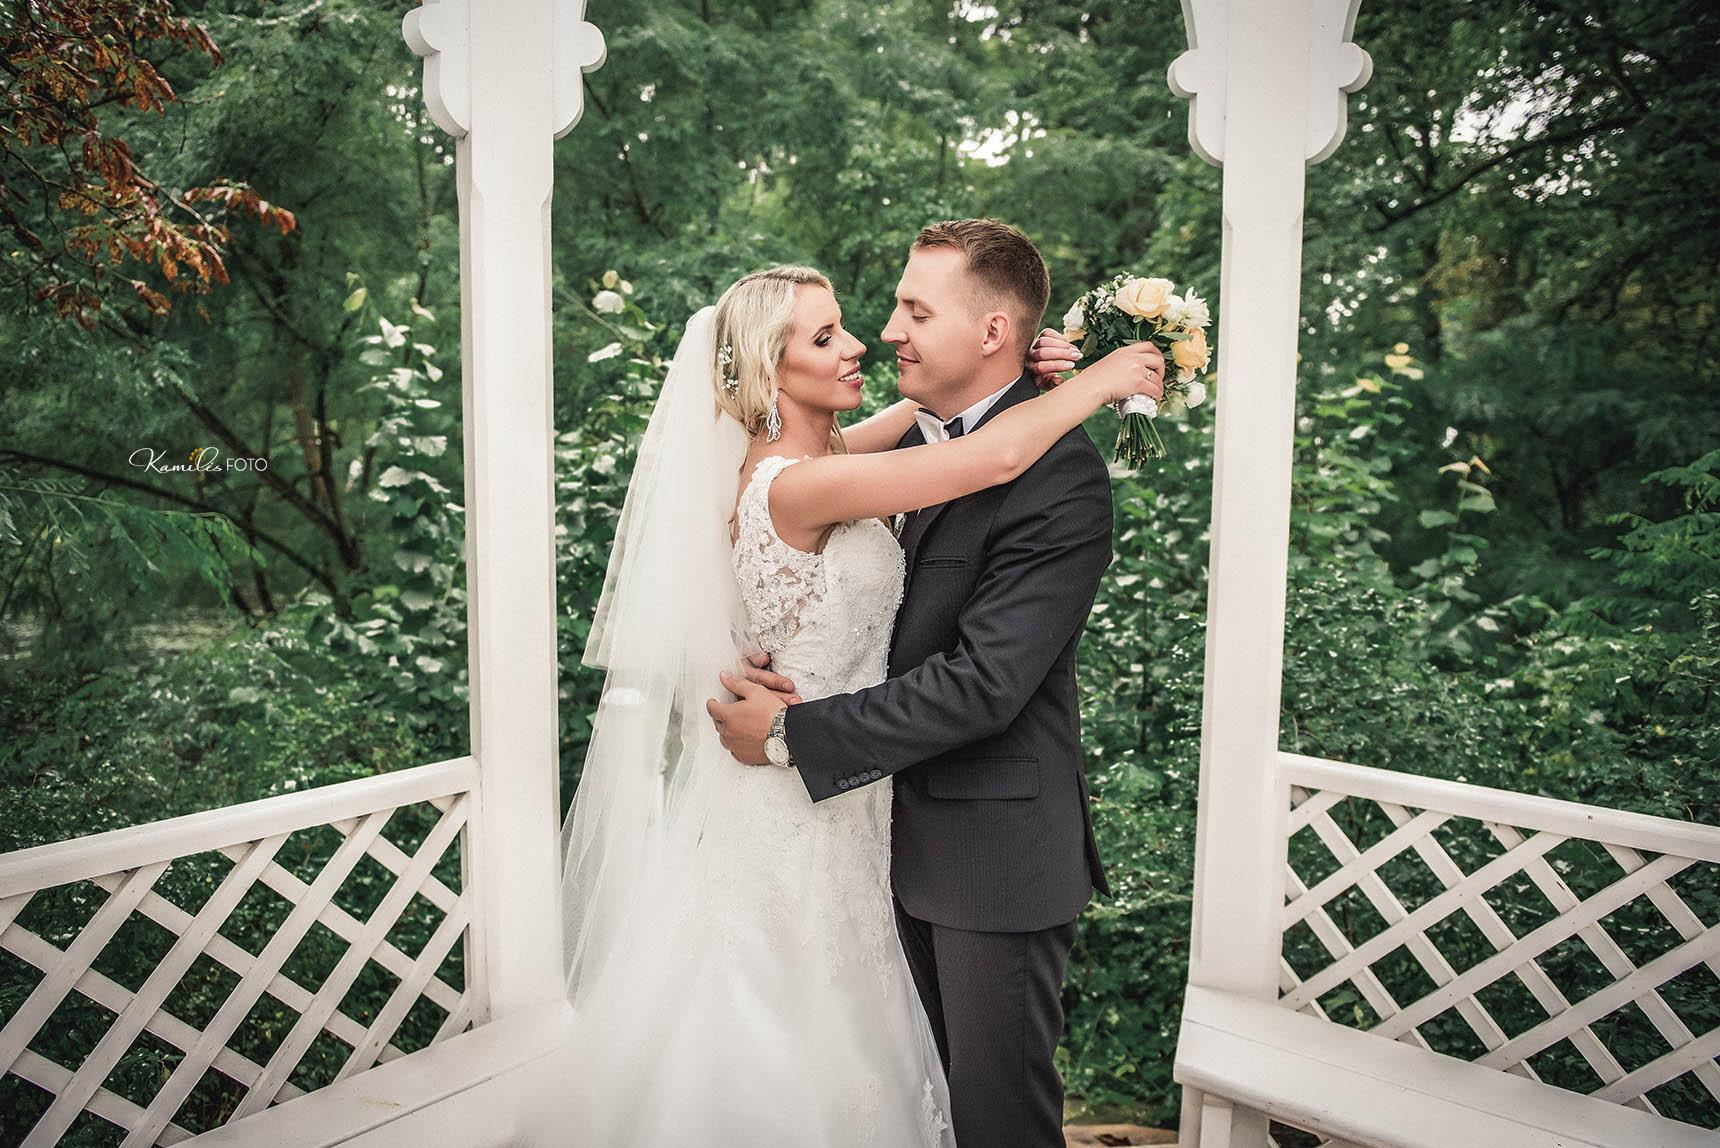 Vestuviu fotografas Vilniuje, vestuviu fotografas Kaune, vestuviu fotografas Klaipedoje, vestuviu fotografas Panevezyje, Kamile Adomaityte